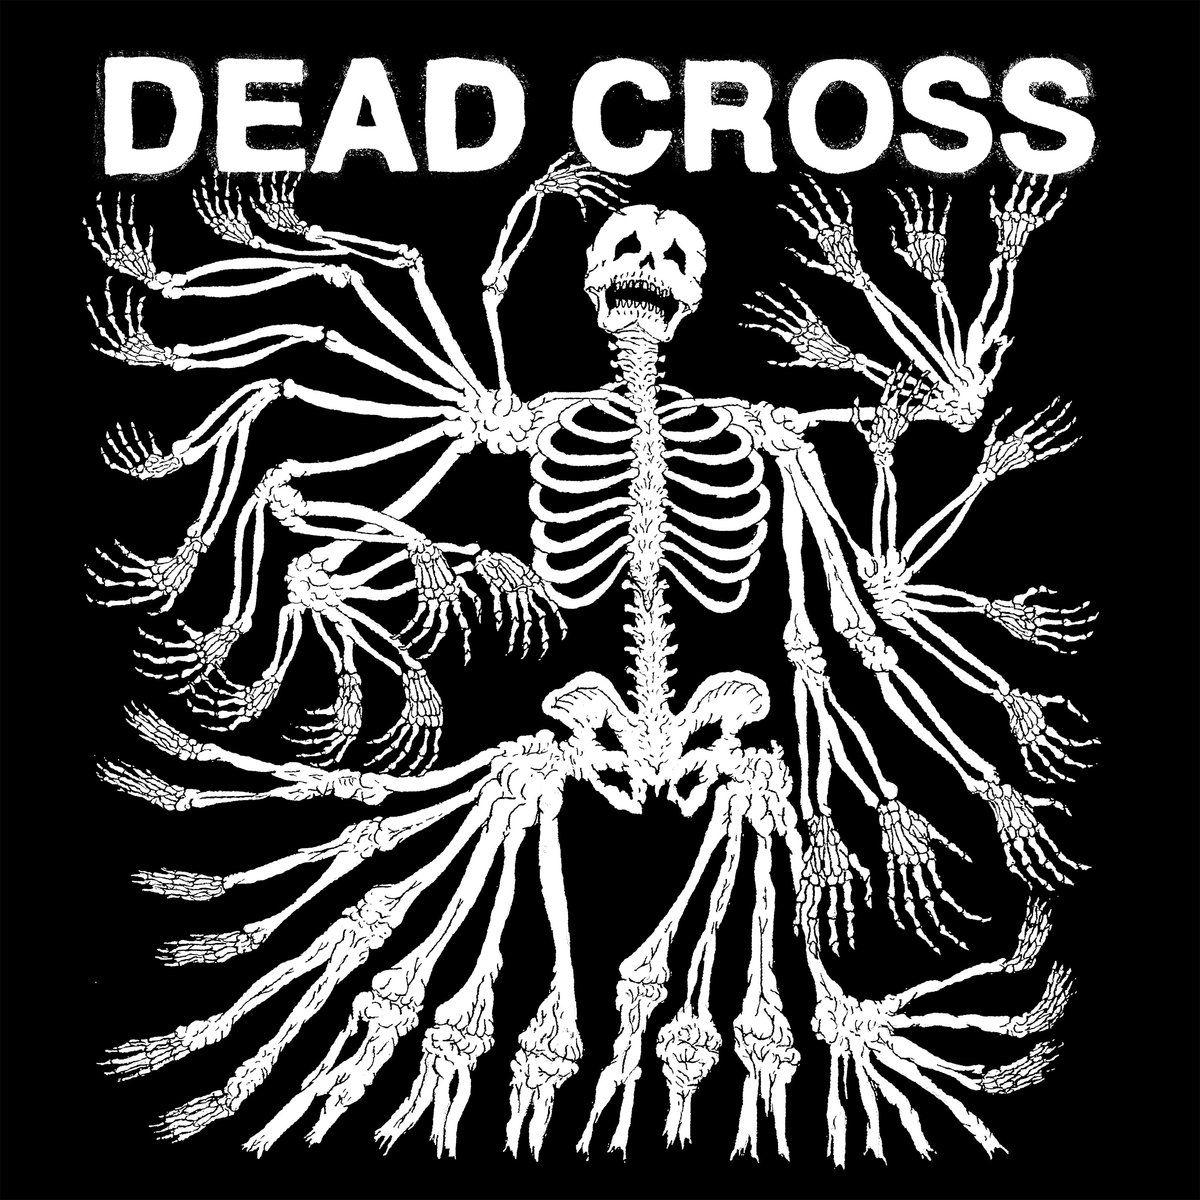 dead cross album stream Mike Patton and Dave Lombardo supergroup Dead Cross release self titled debut album: Stream